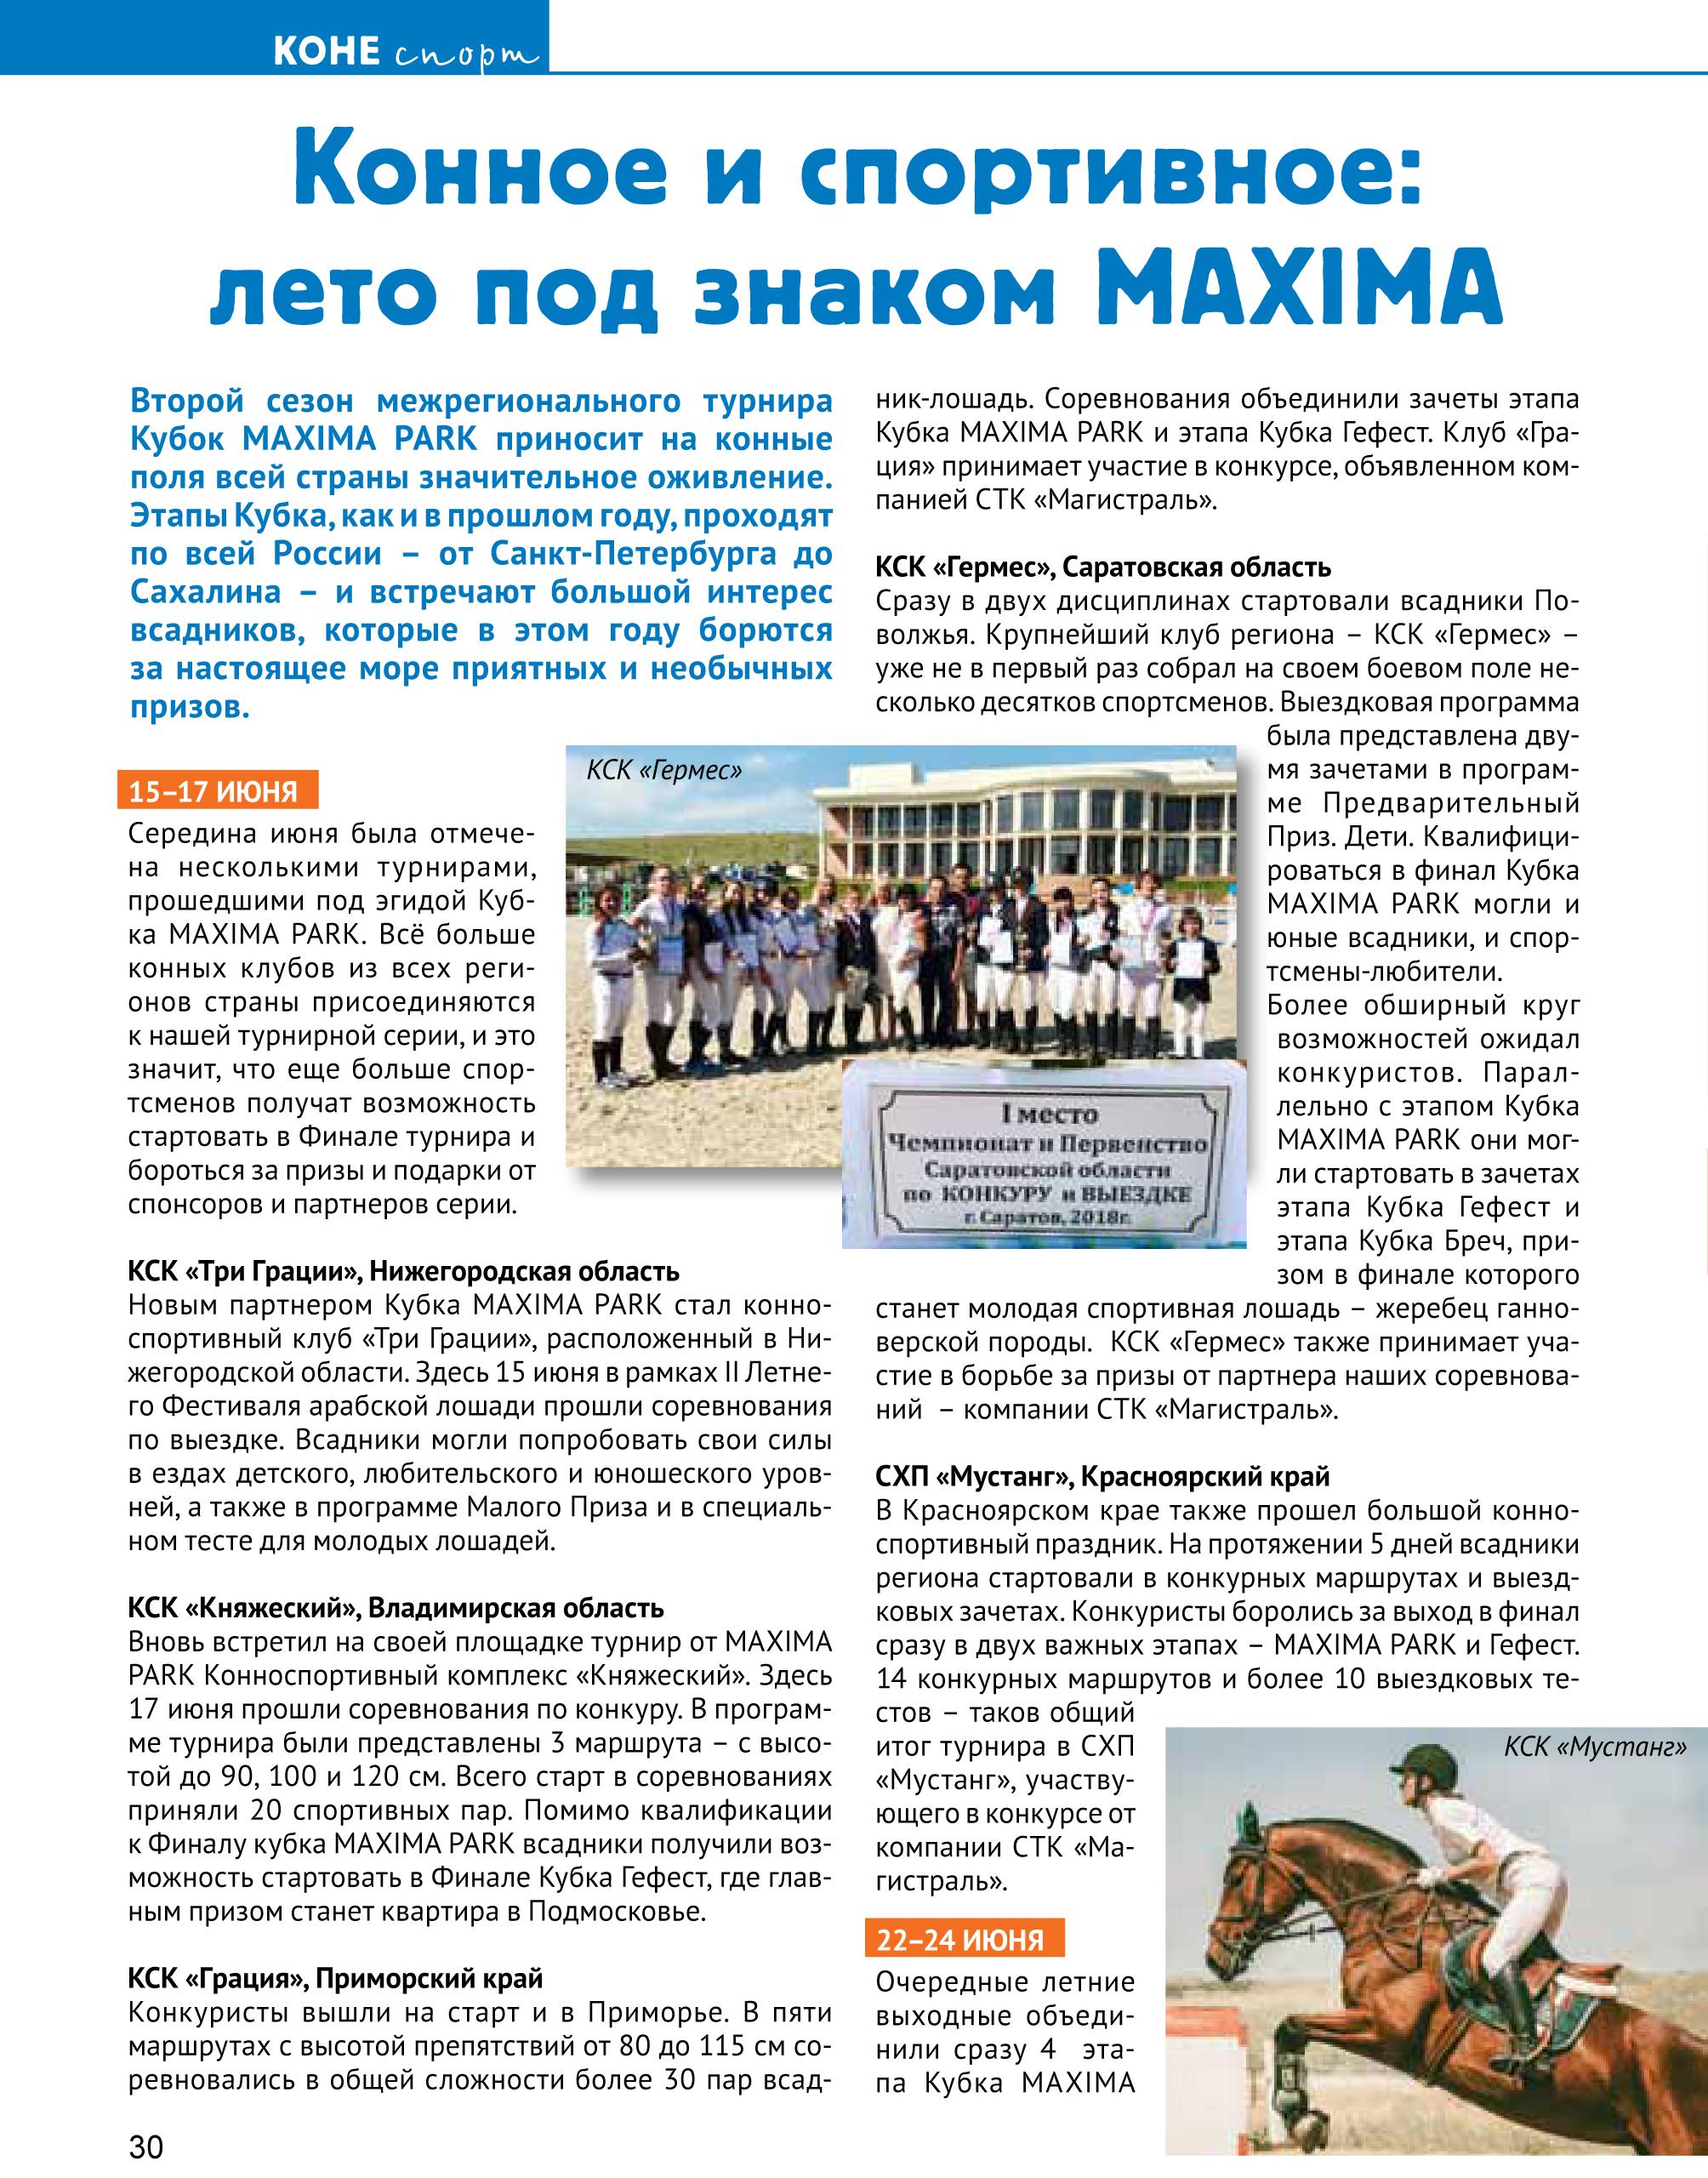 Book 5 2018 ДЛЯ САЙТА-30